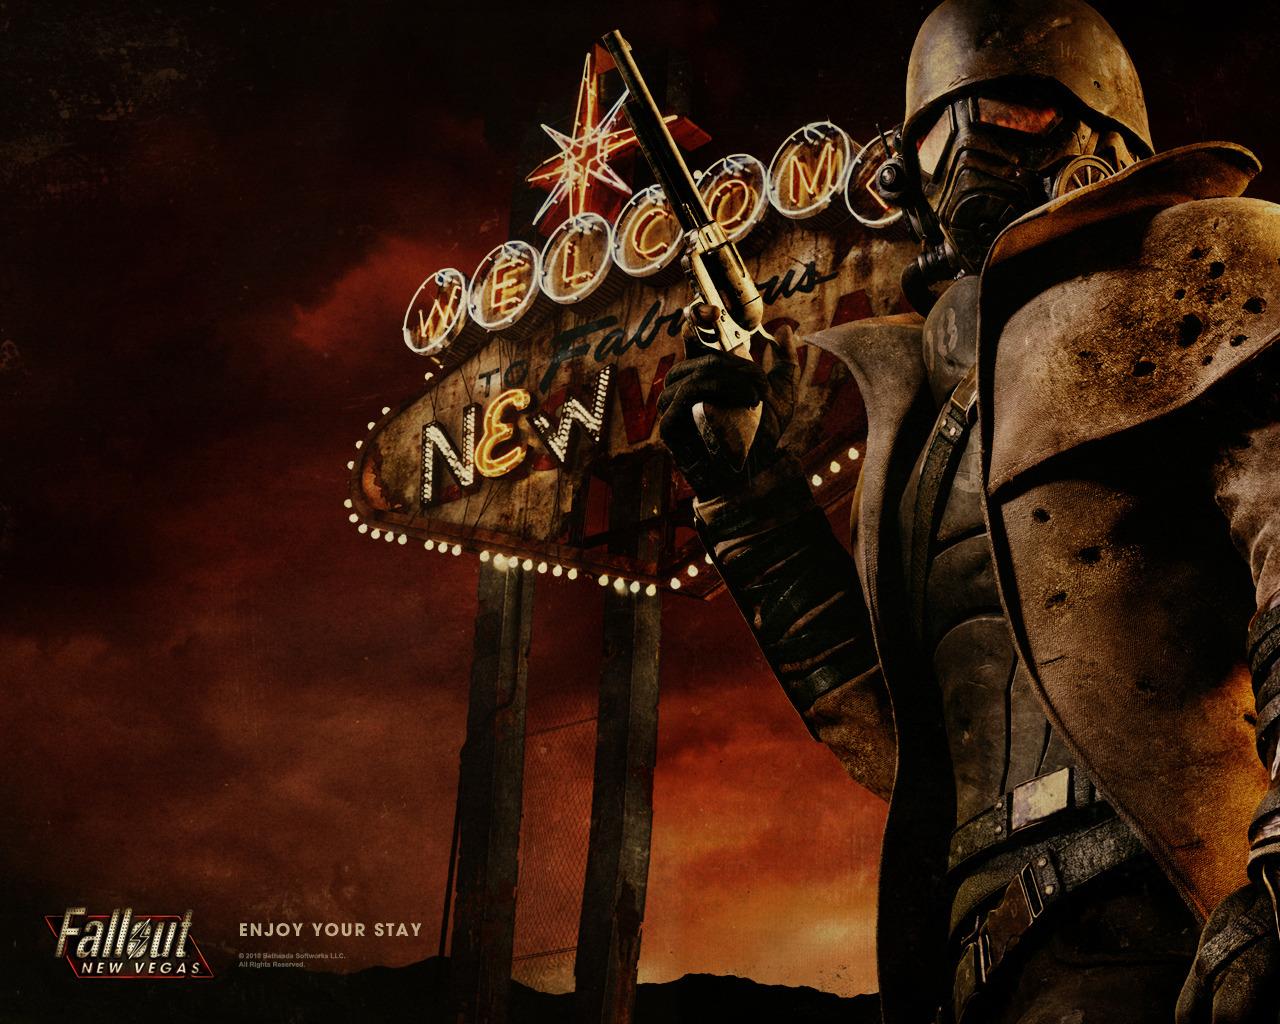 Fallout new vegas не запускается на windows 10 - 1a